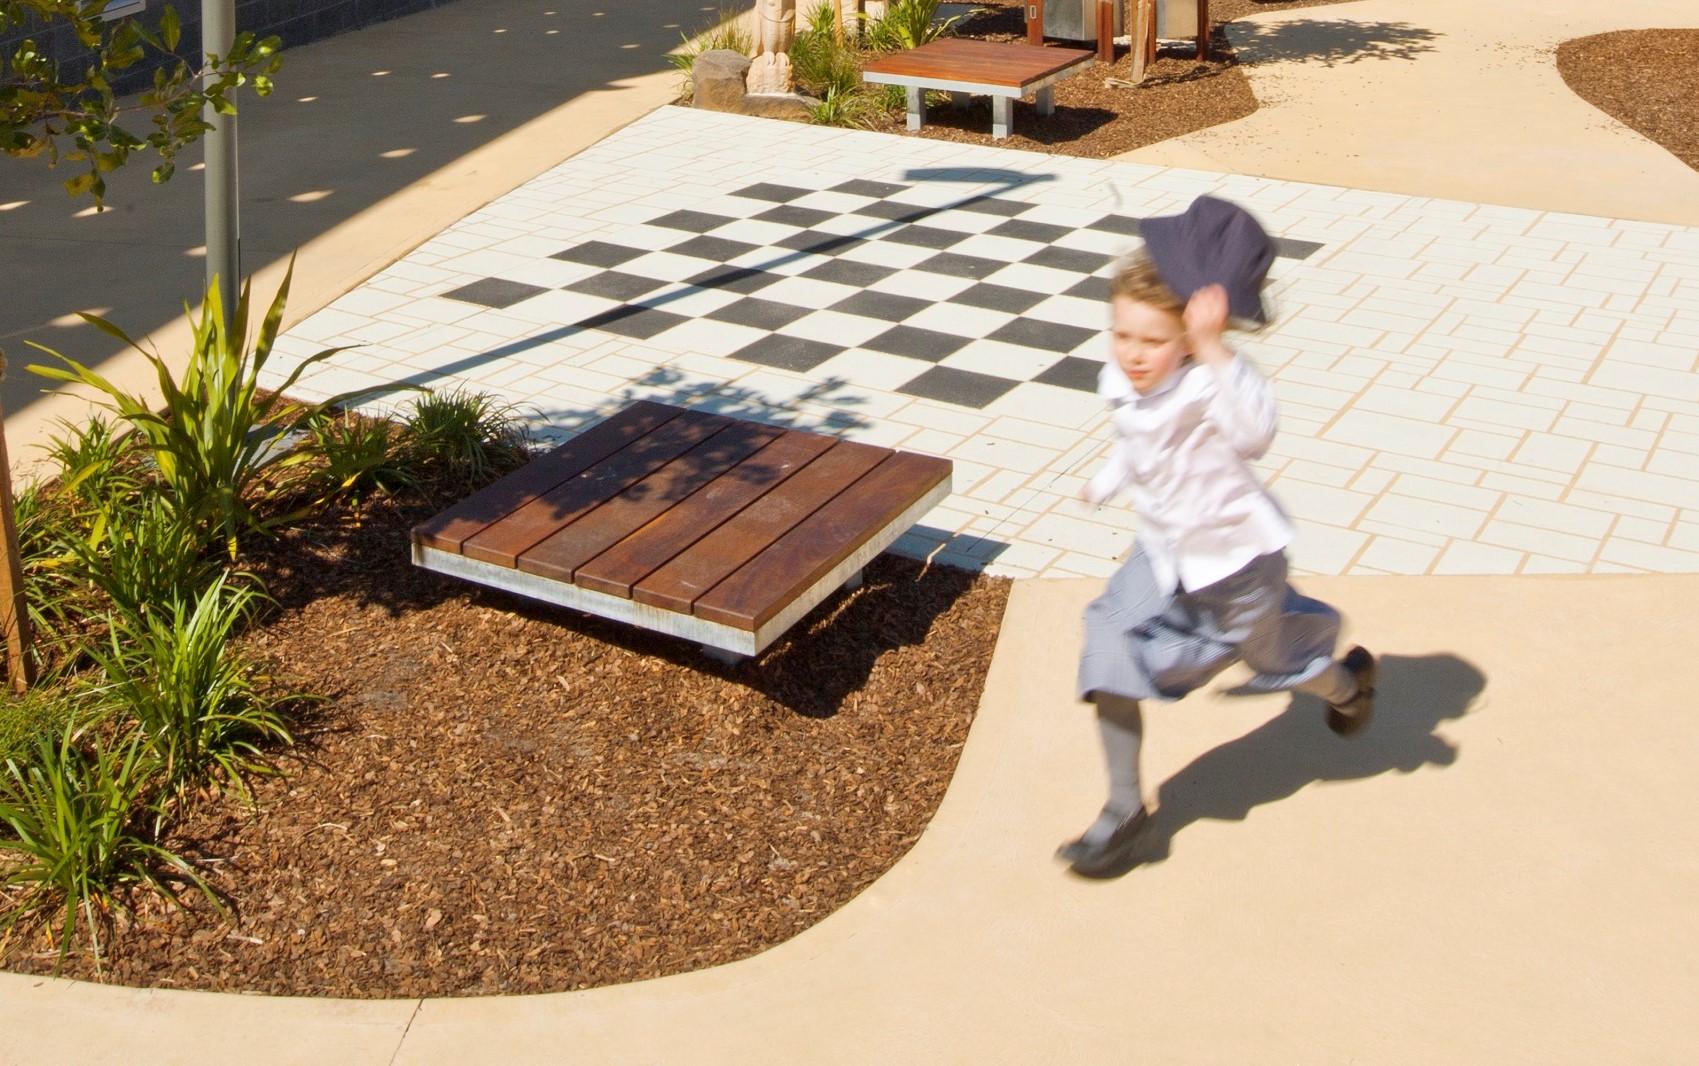 Redlands Preparatory School Child Playing – Gardner Wetherill GW 4